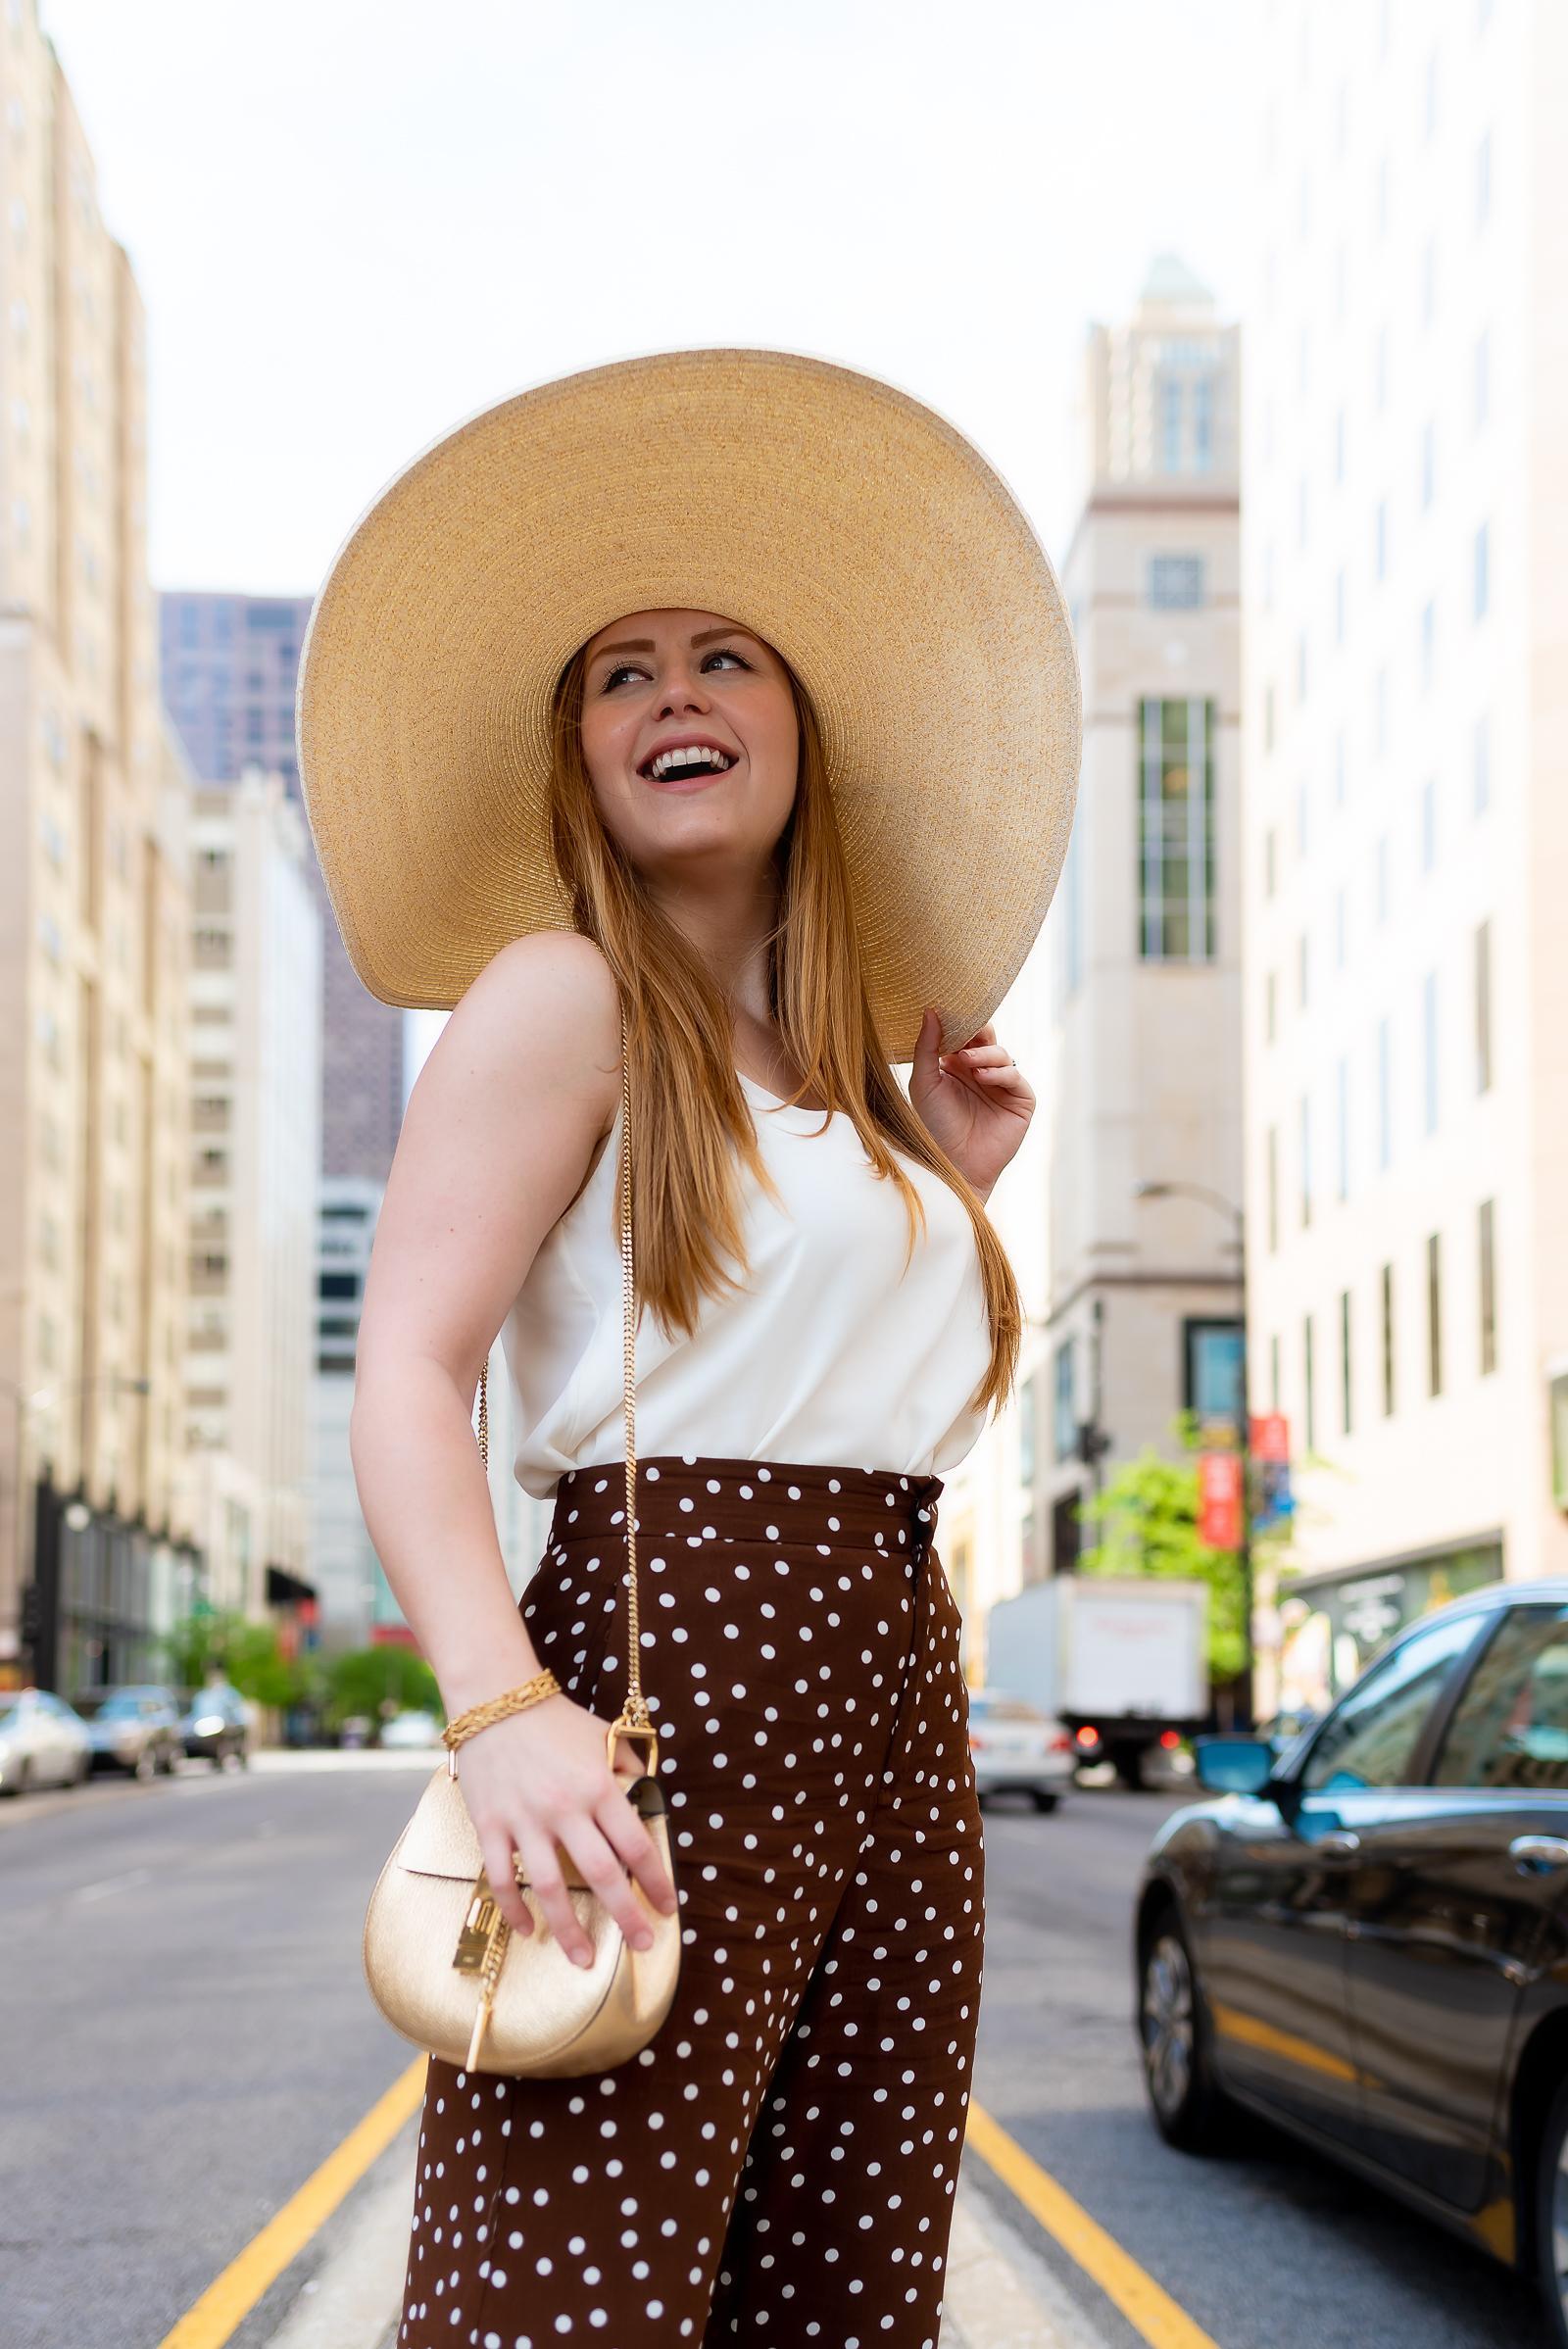 Polka Dot Summer Outfit